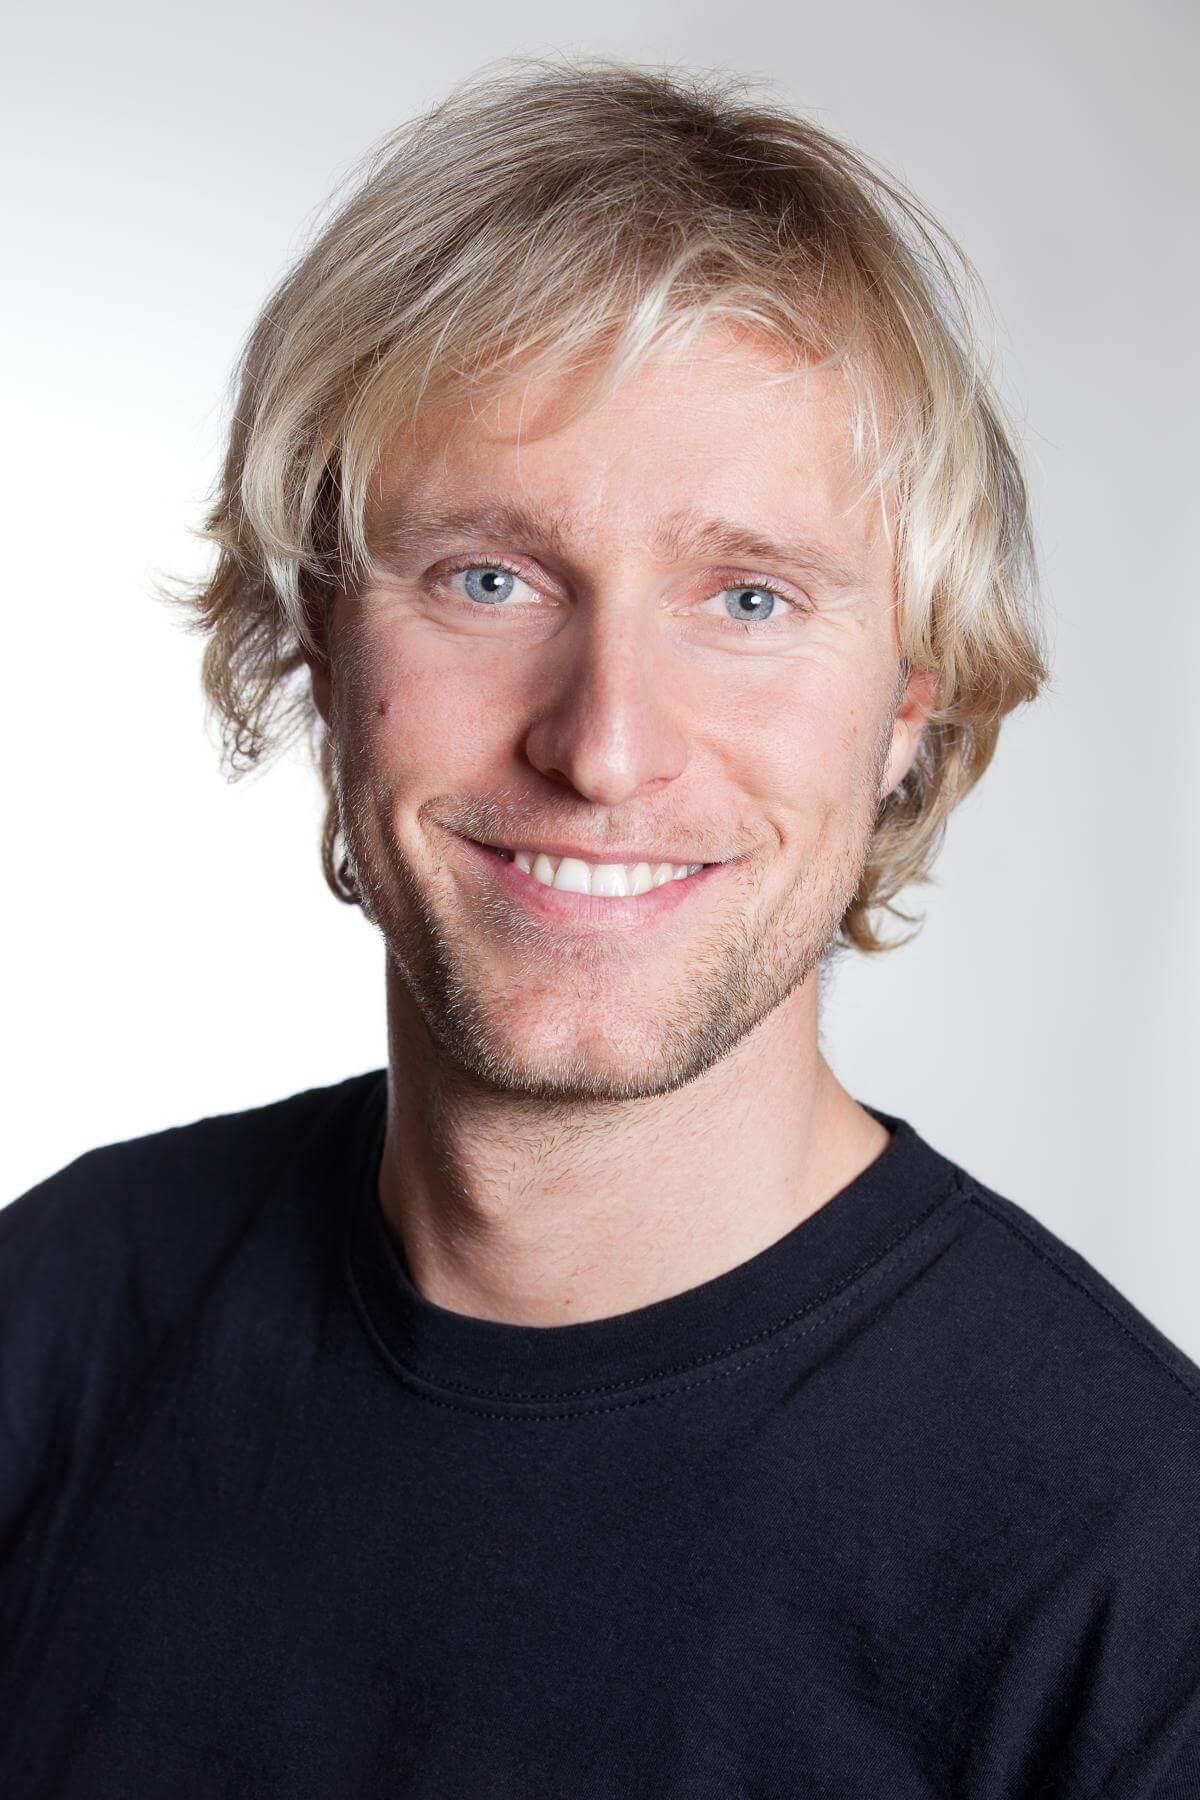 Patrick Tuchczynski